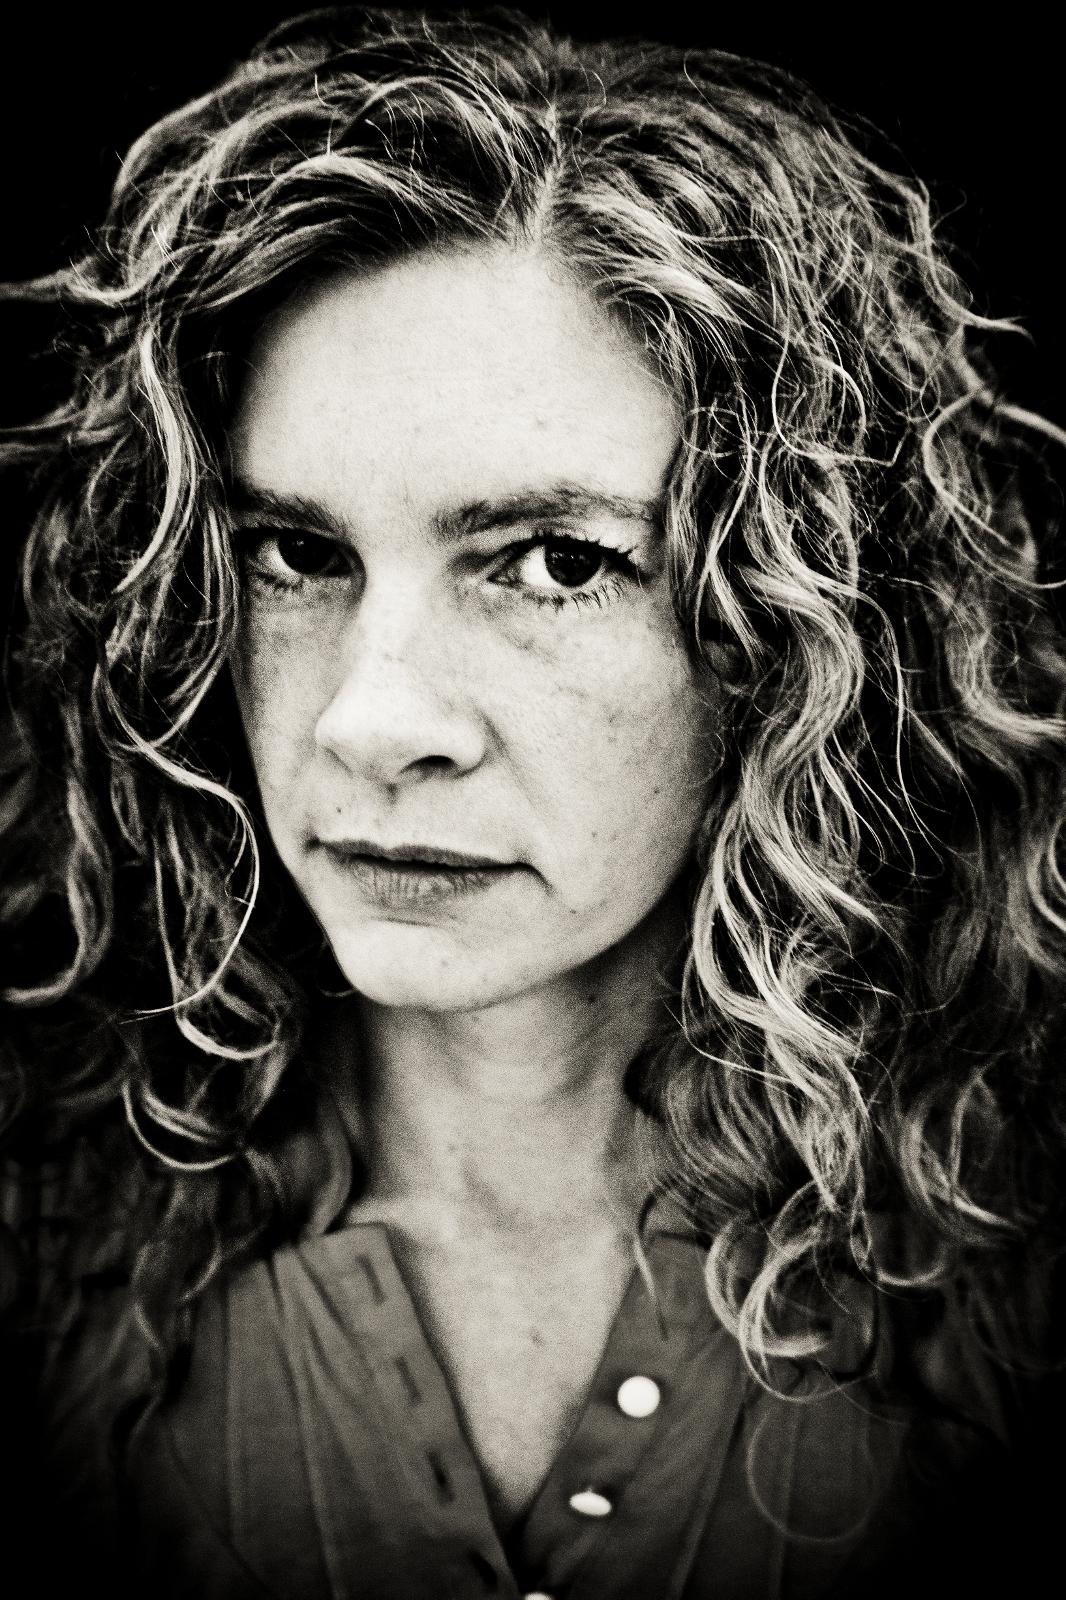 Photo by: Kajsa Gullberg.